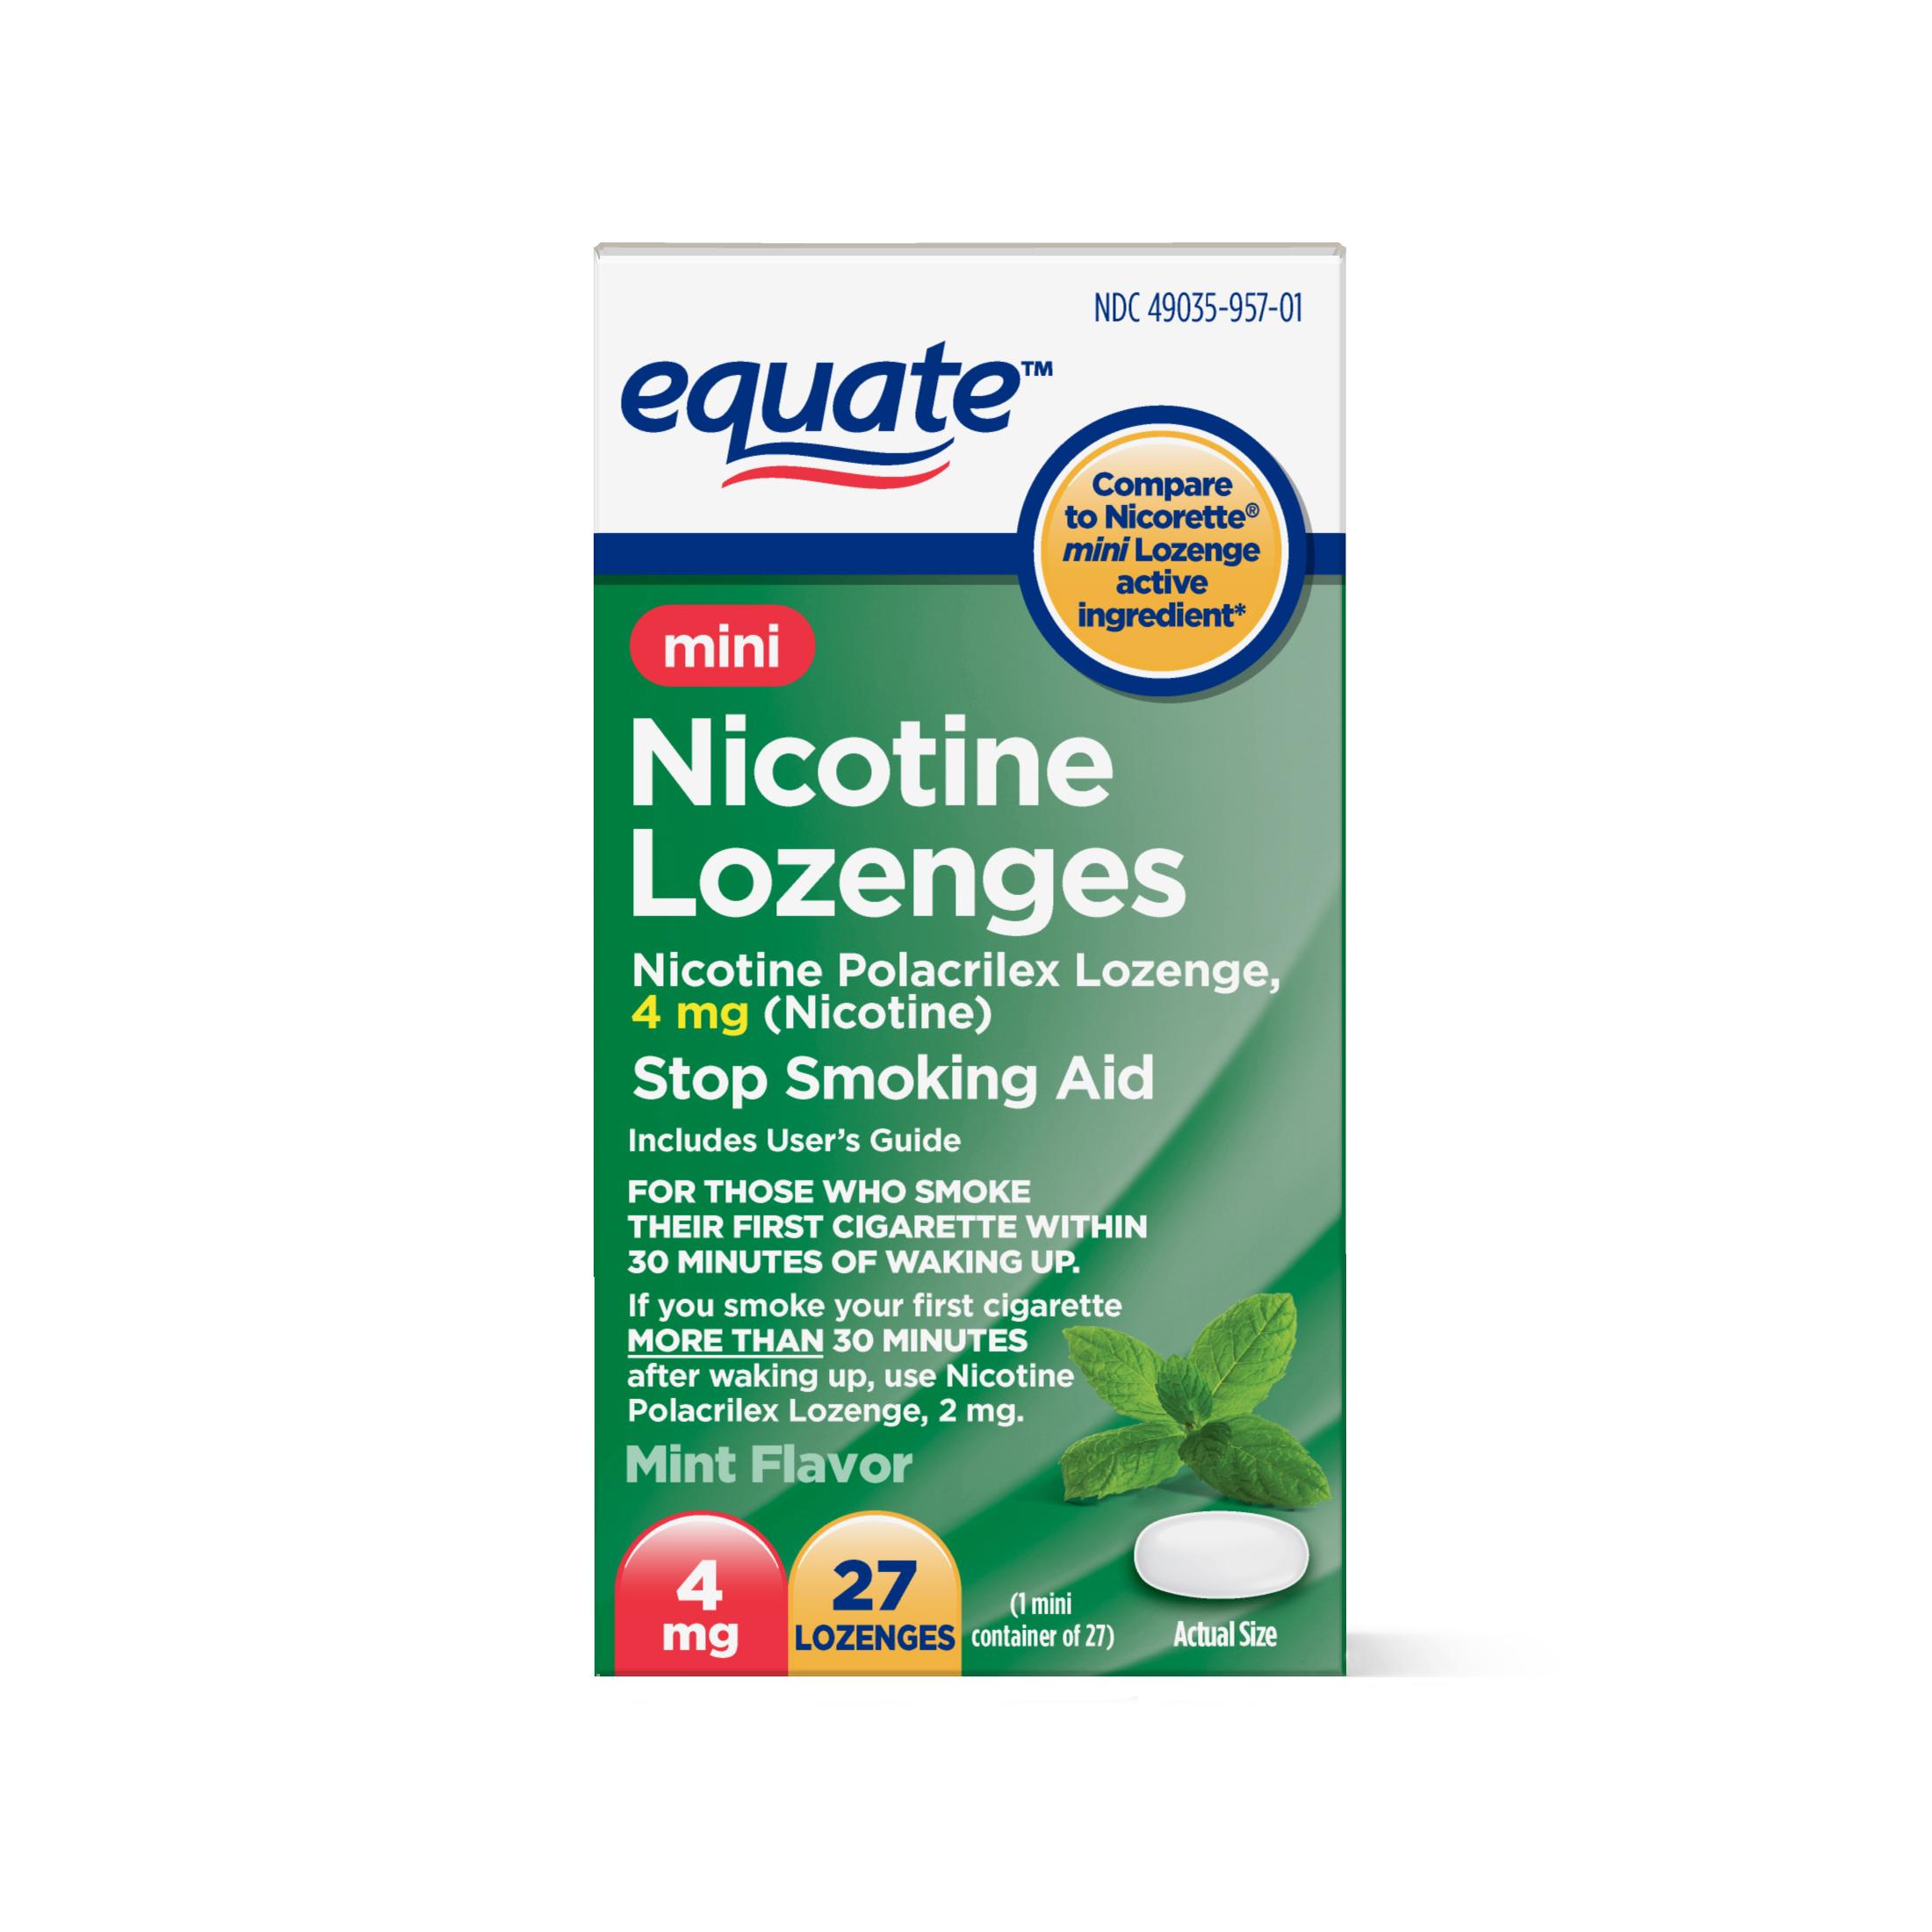 Equate Mini Nicotine Lozenge Stop Smoking Aid, Mint Flavor, 4 mg, 27 Ct